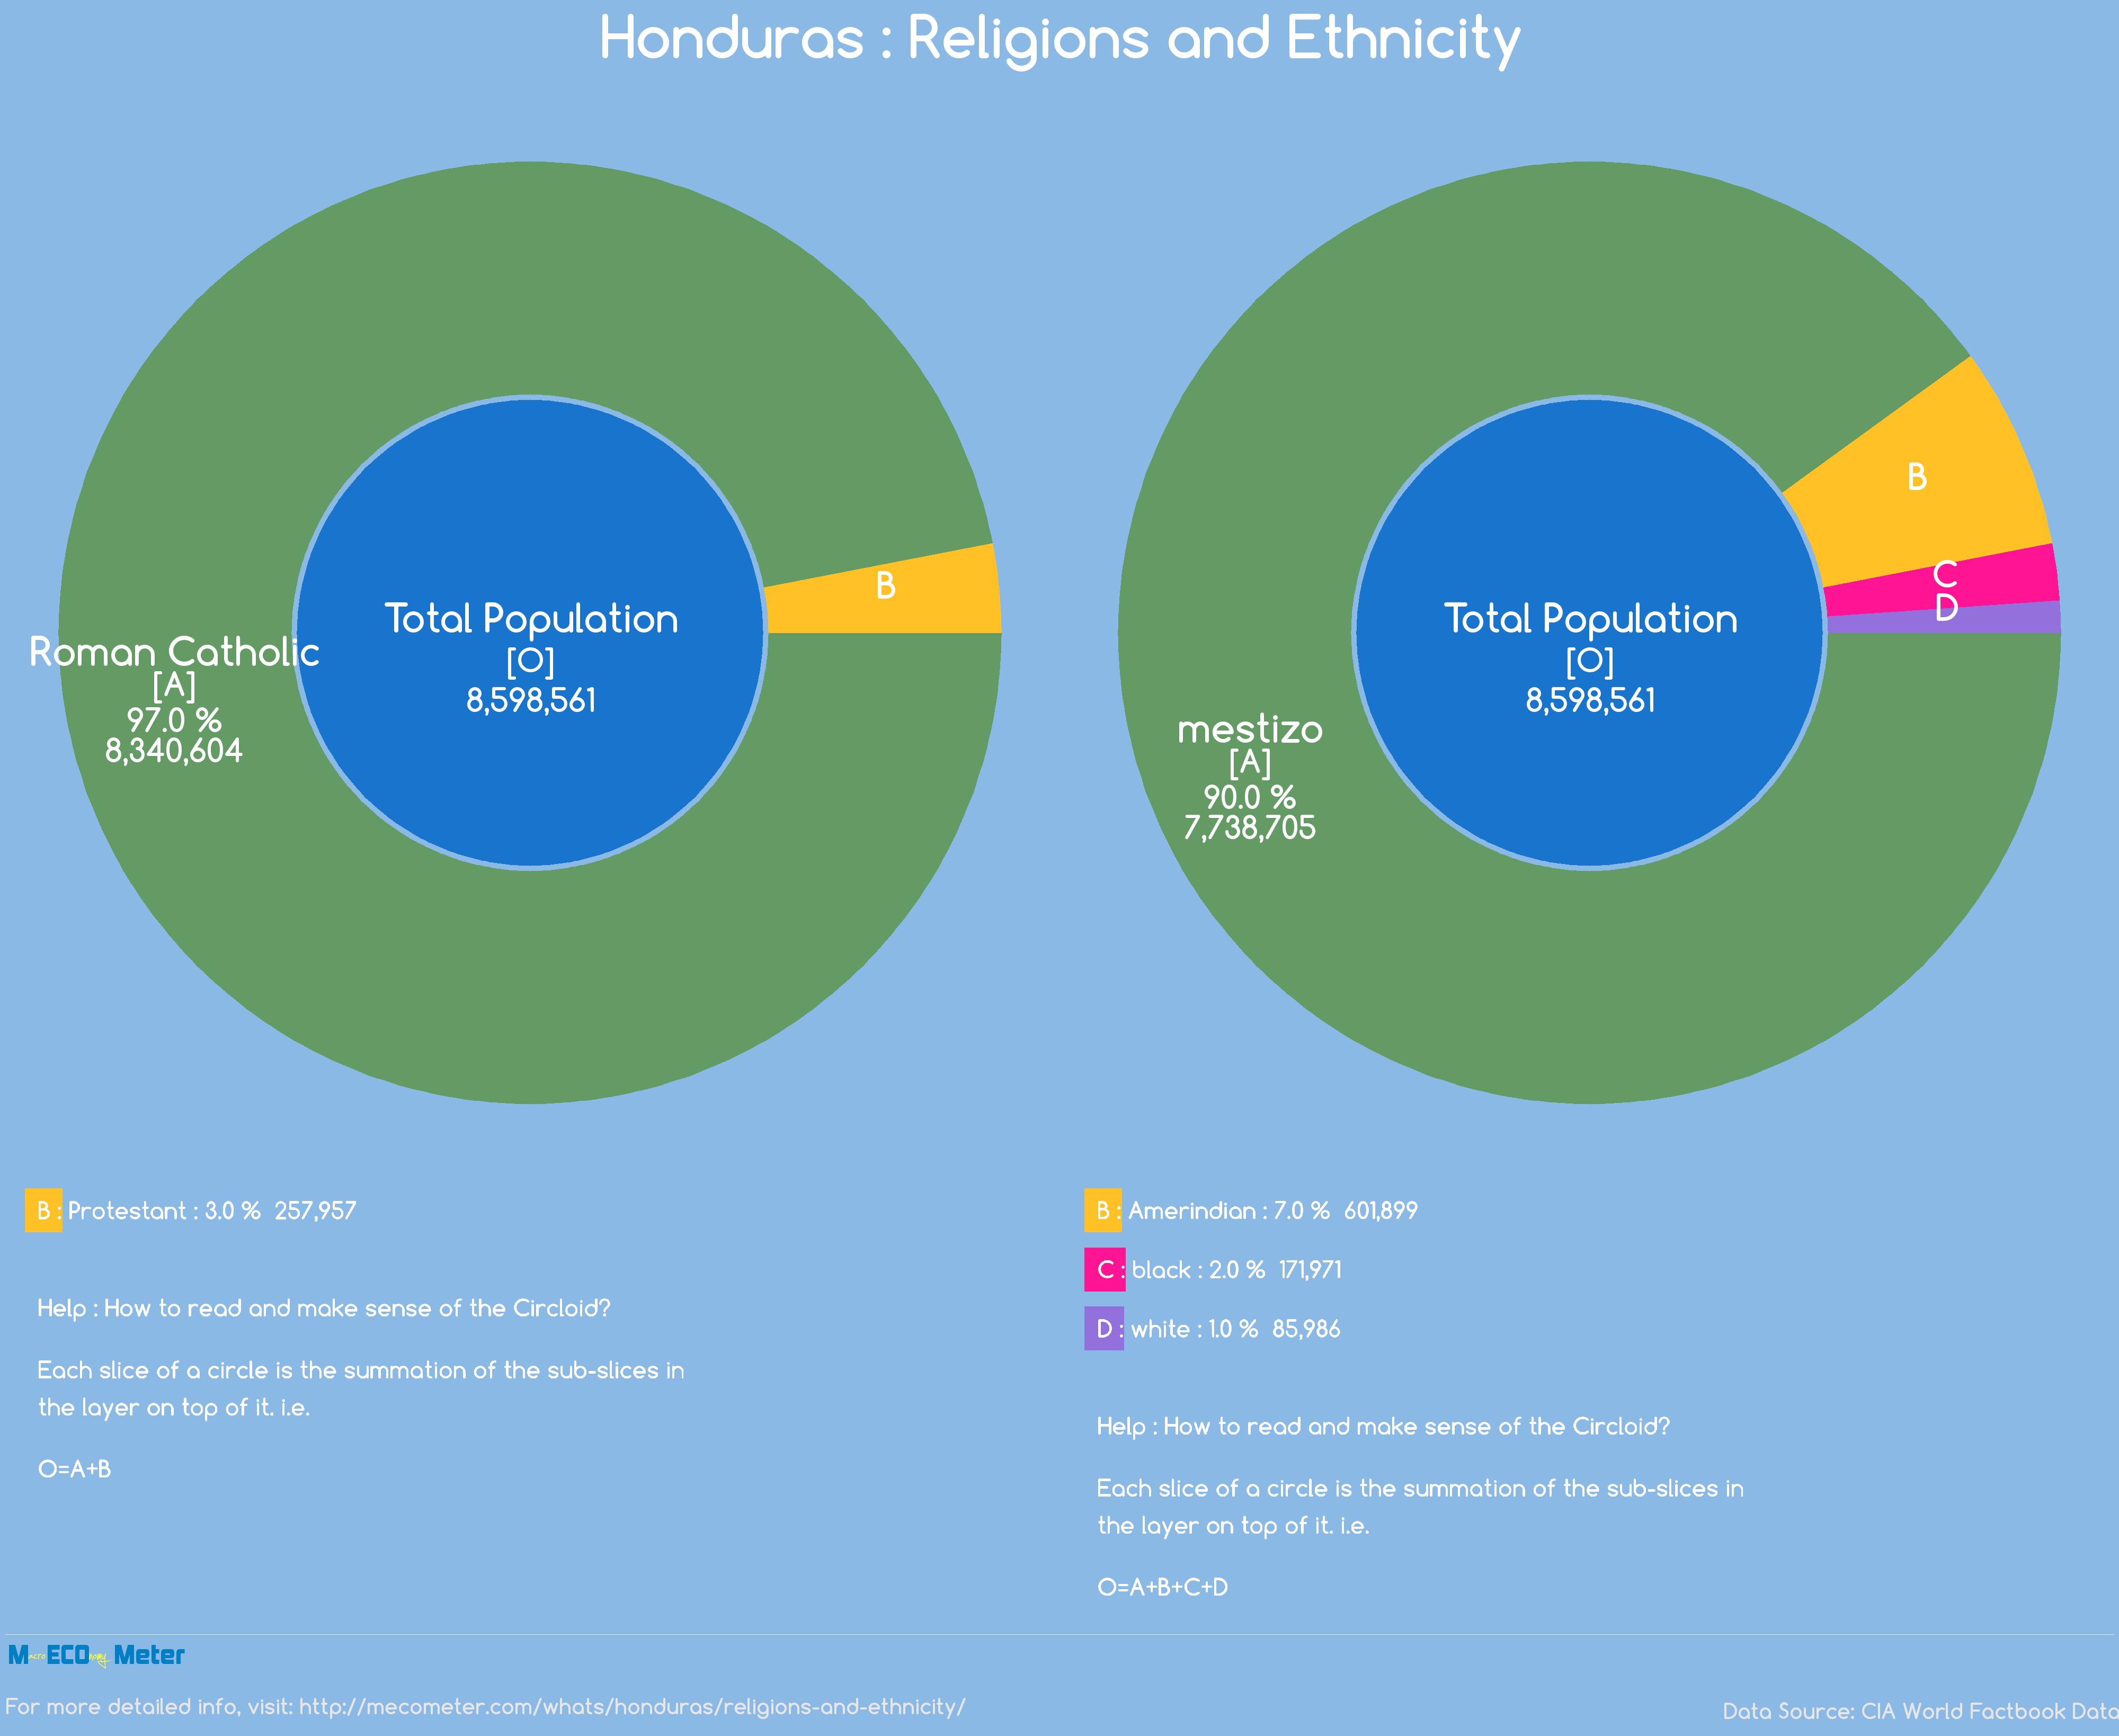 Honduras : Religions and Ethnicity